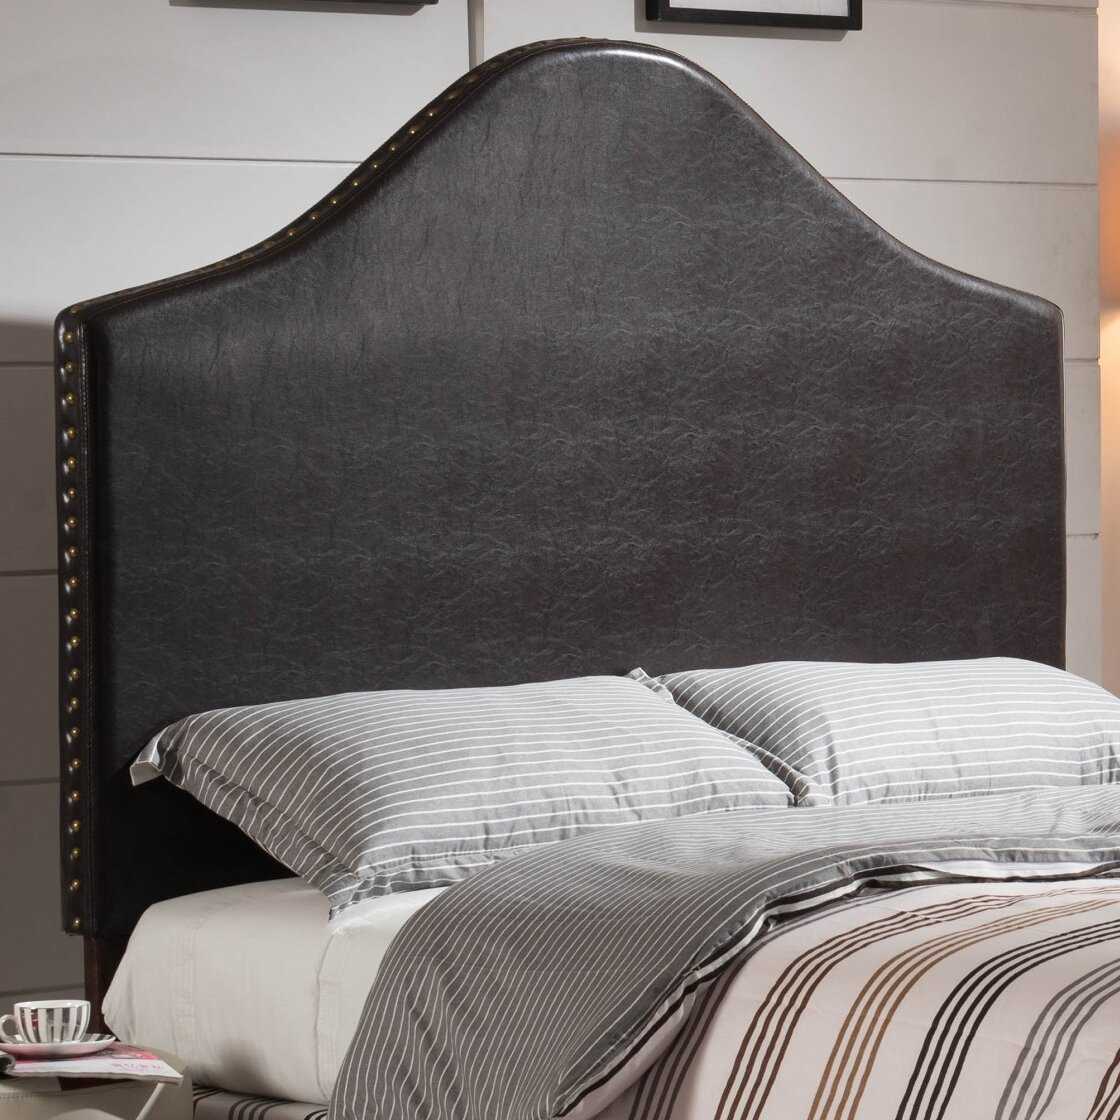 Noya Usa Luxury Queen Upholstered Headboard Reviews